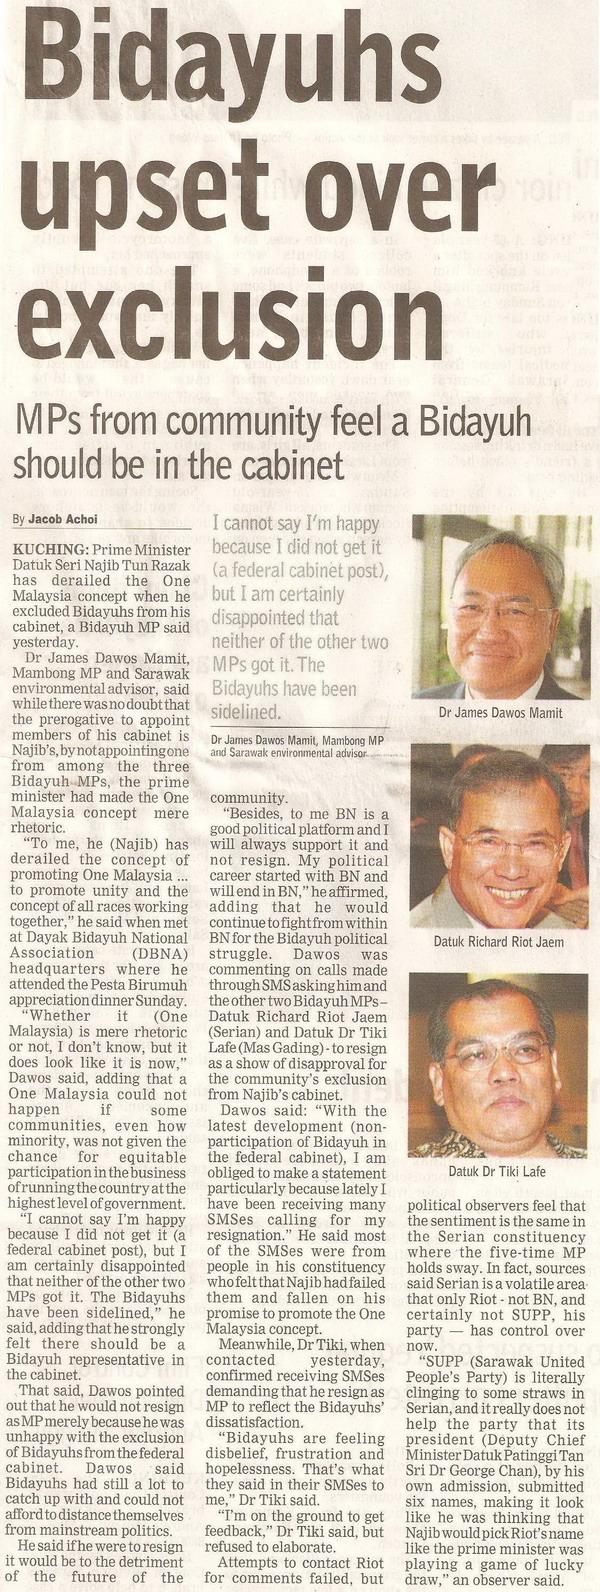 Borneo Post. 2009. Bidayuhs upset over exclusion. April 14, 2009 Edition.